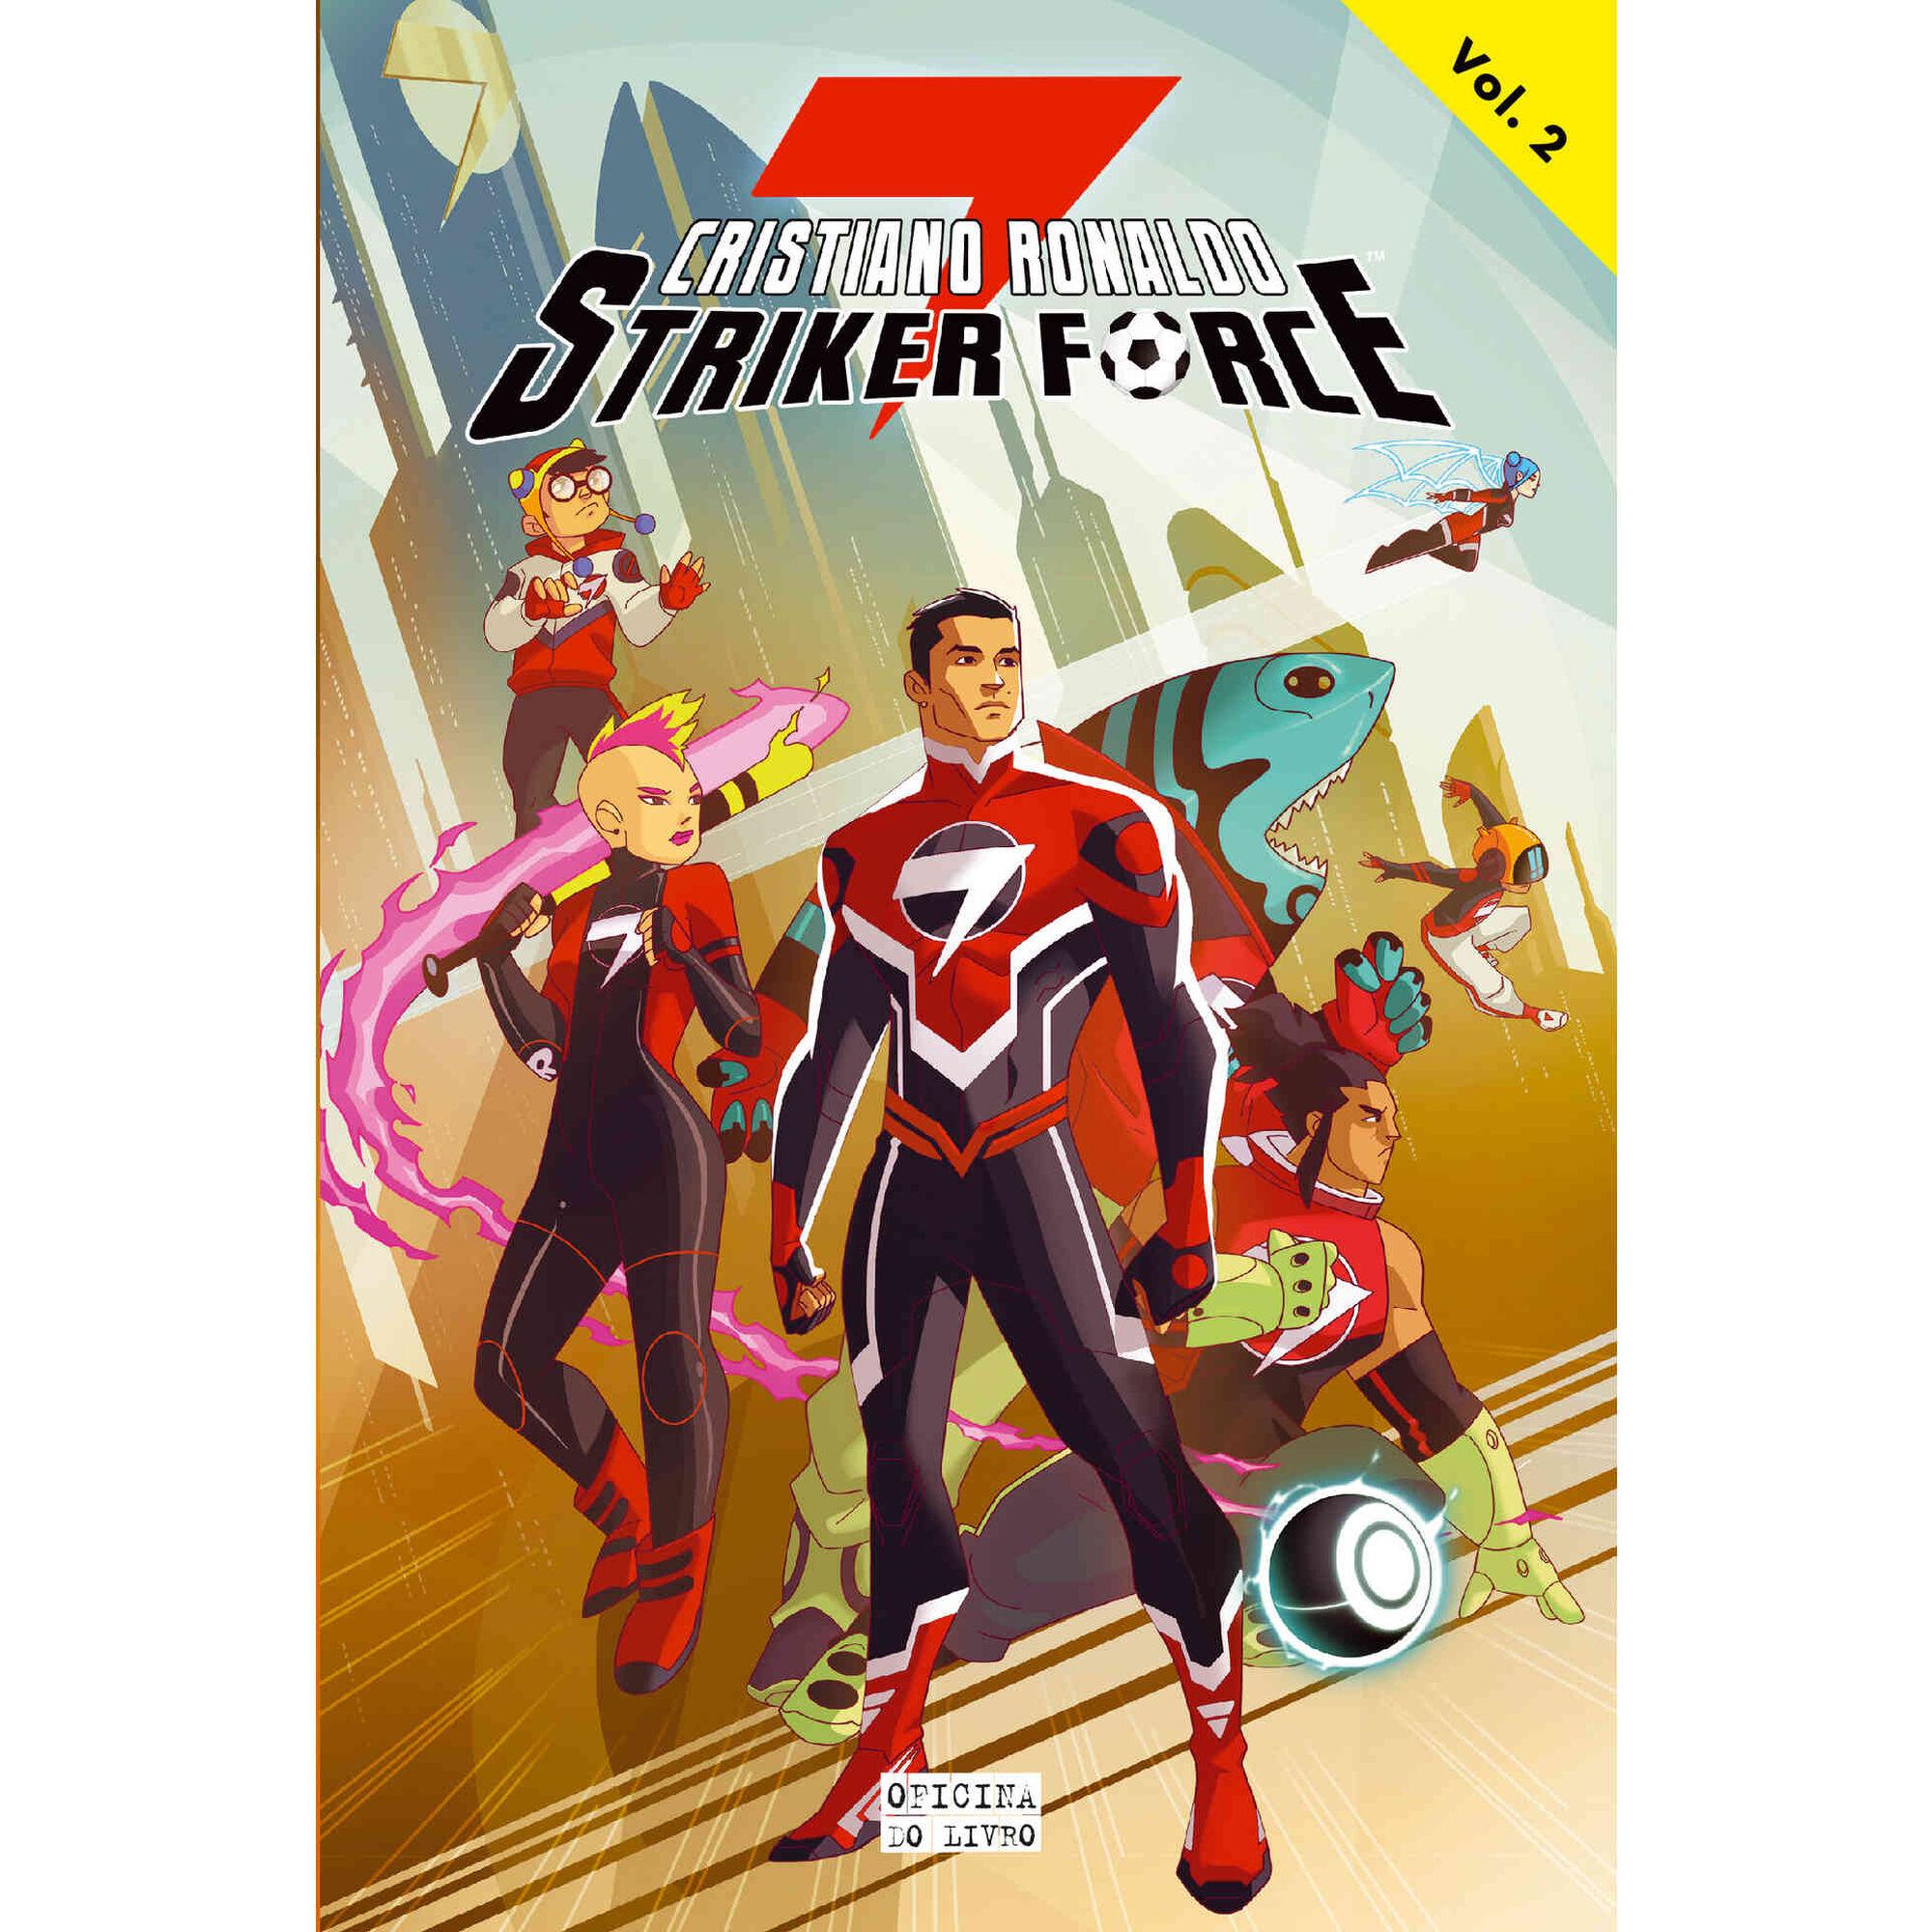 Striker Force 7 (volume 2)